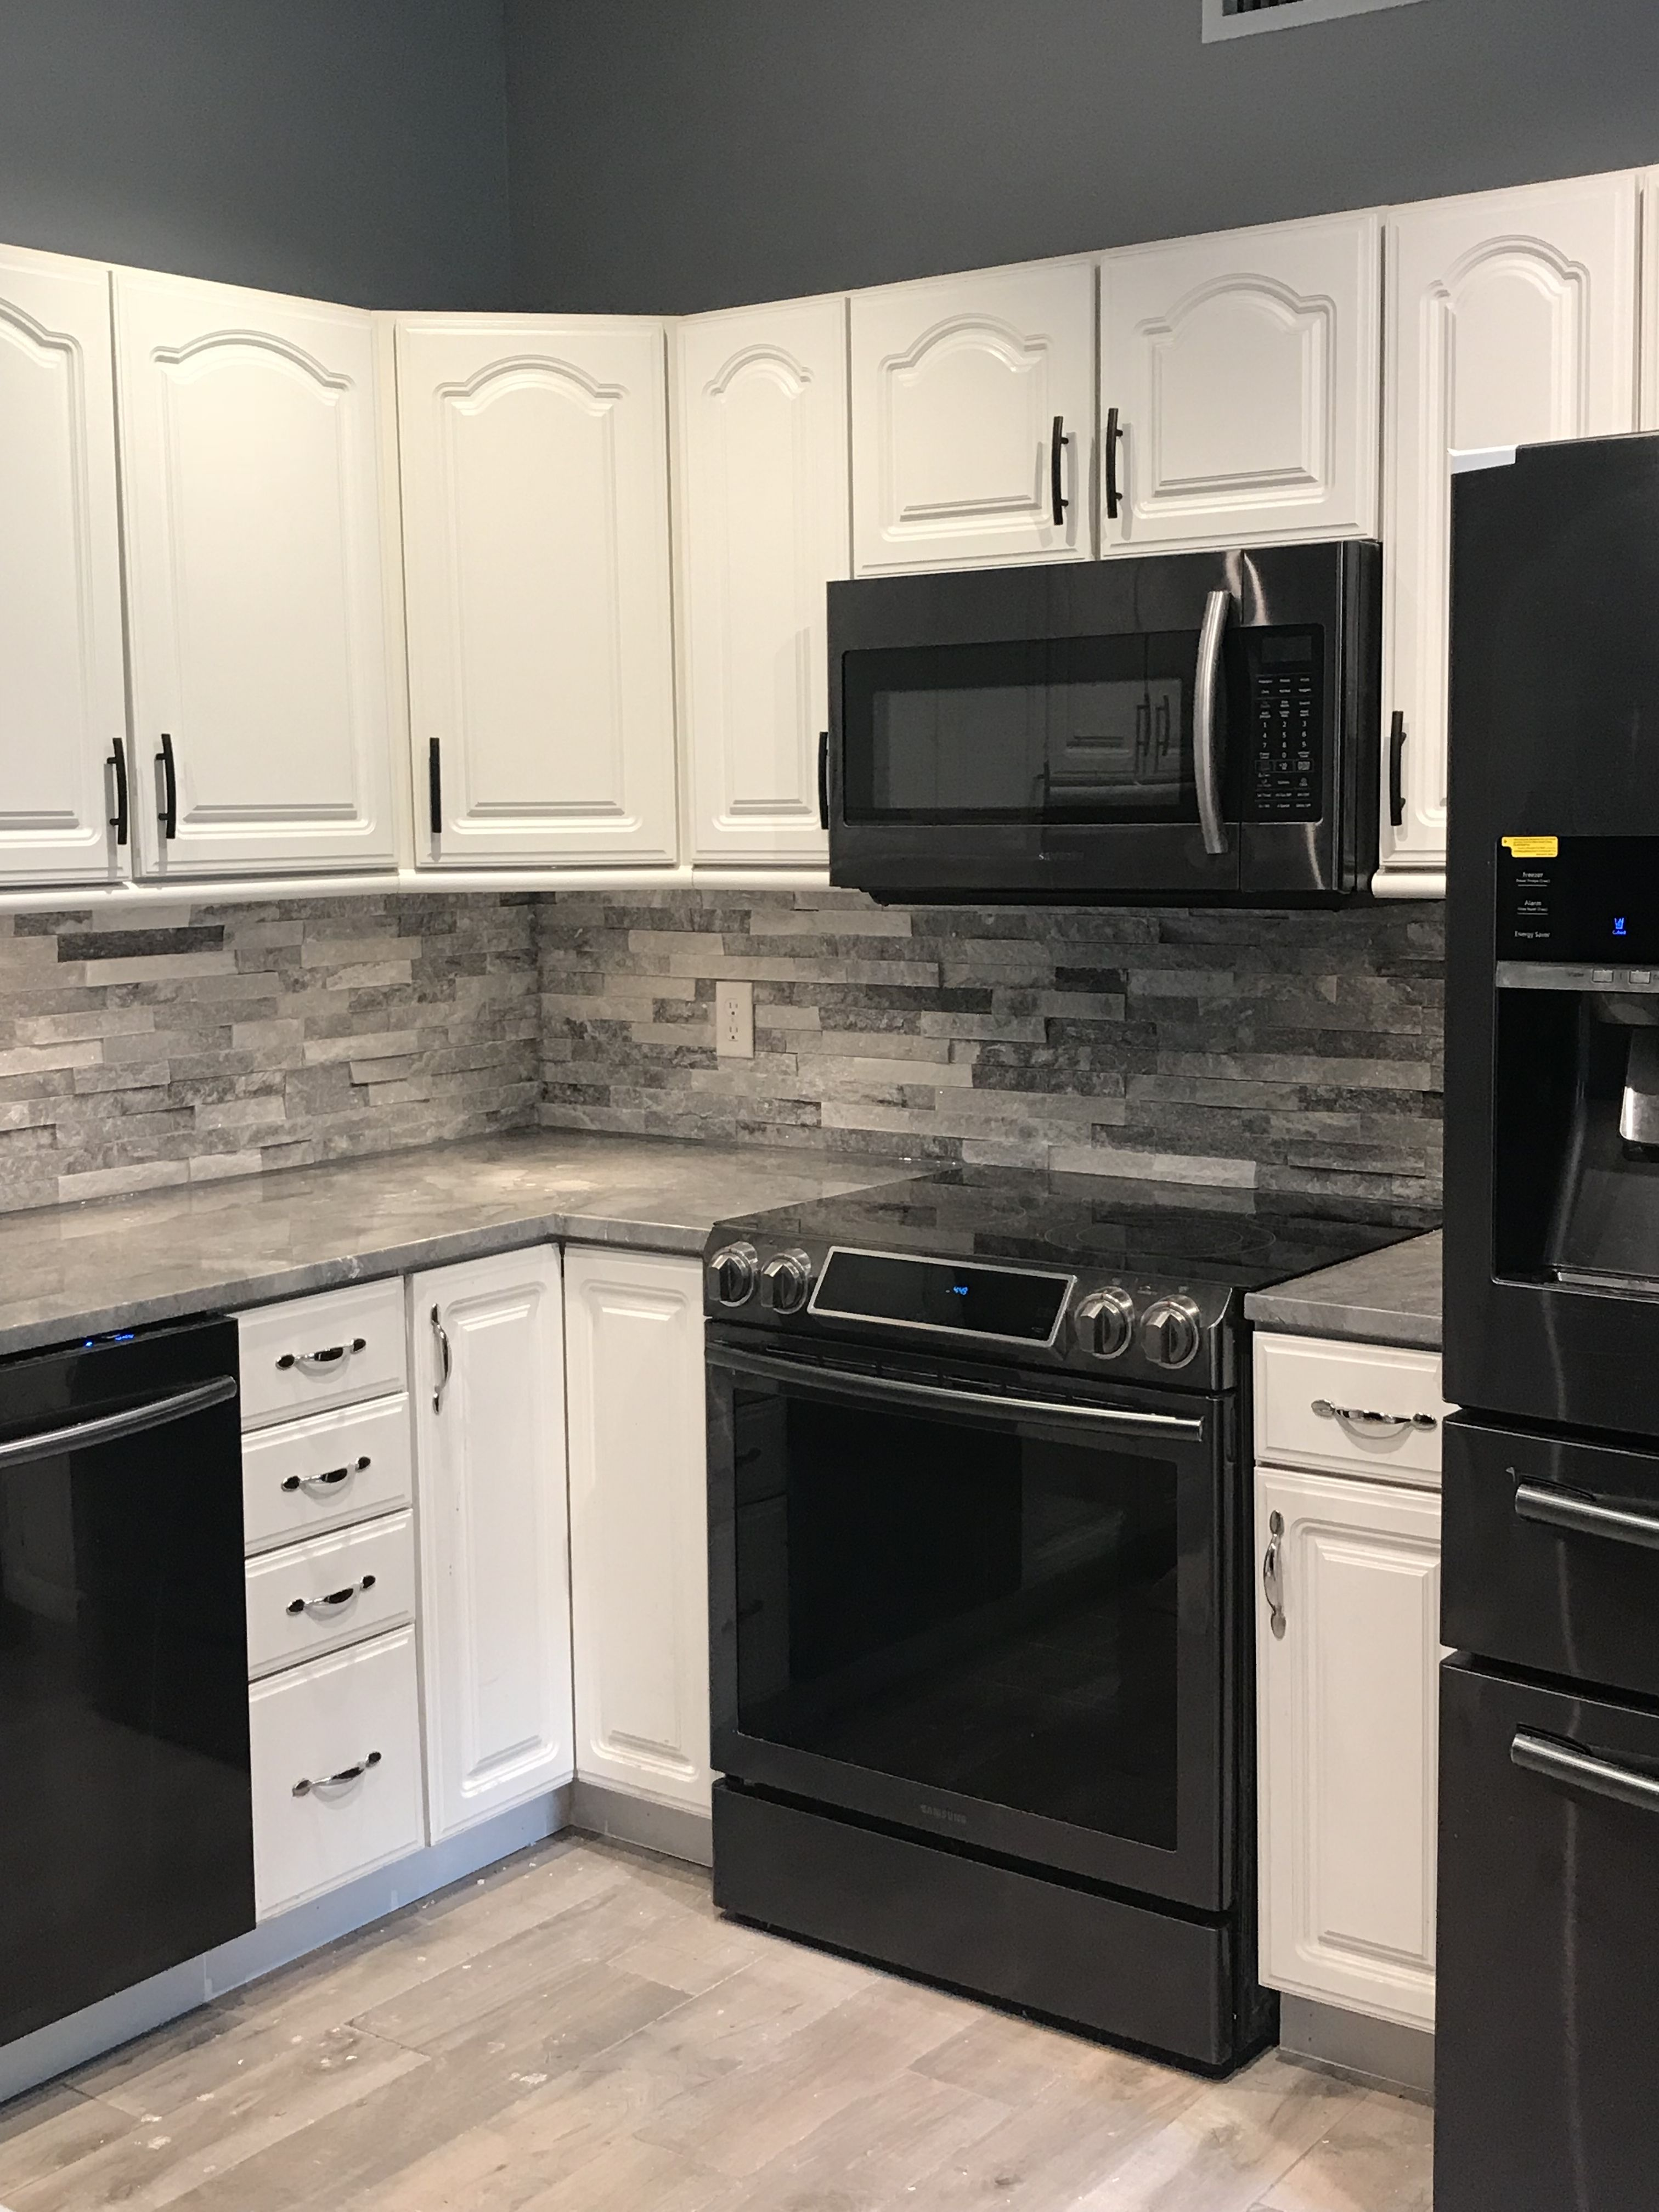 Stackstone backsplash, black stainless appliances White